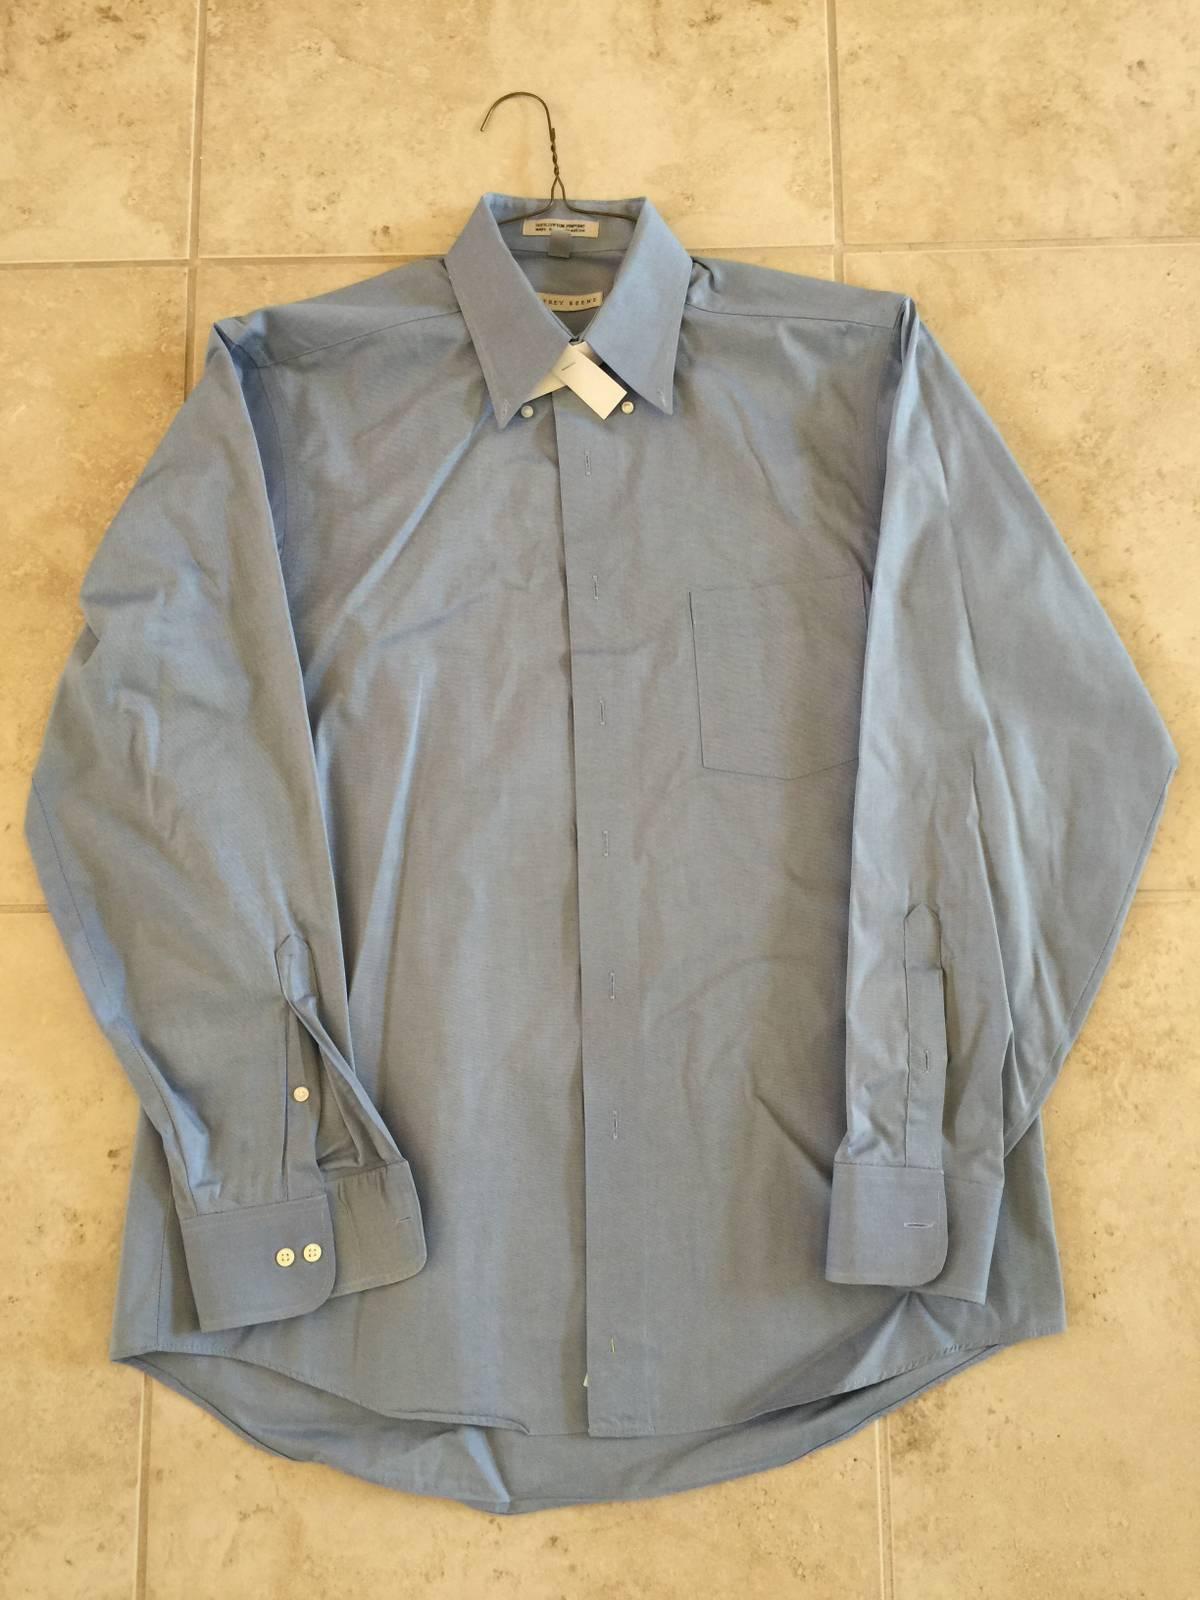 Geoffrey Beene Dress Shirt Size L Shirts Button Ups For Sale